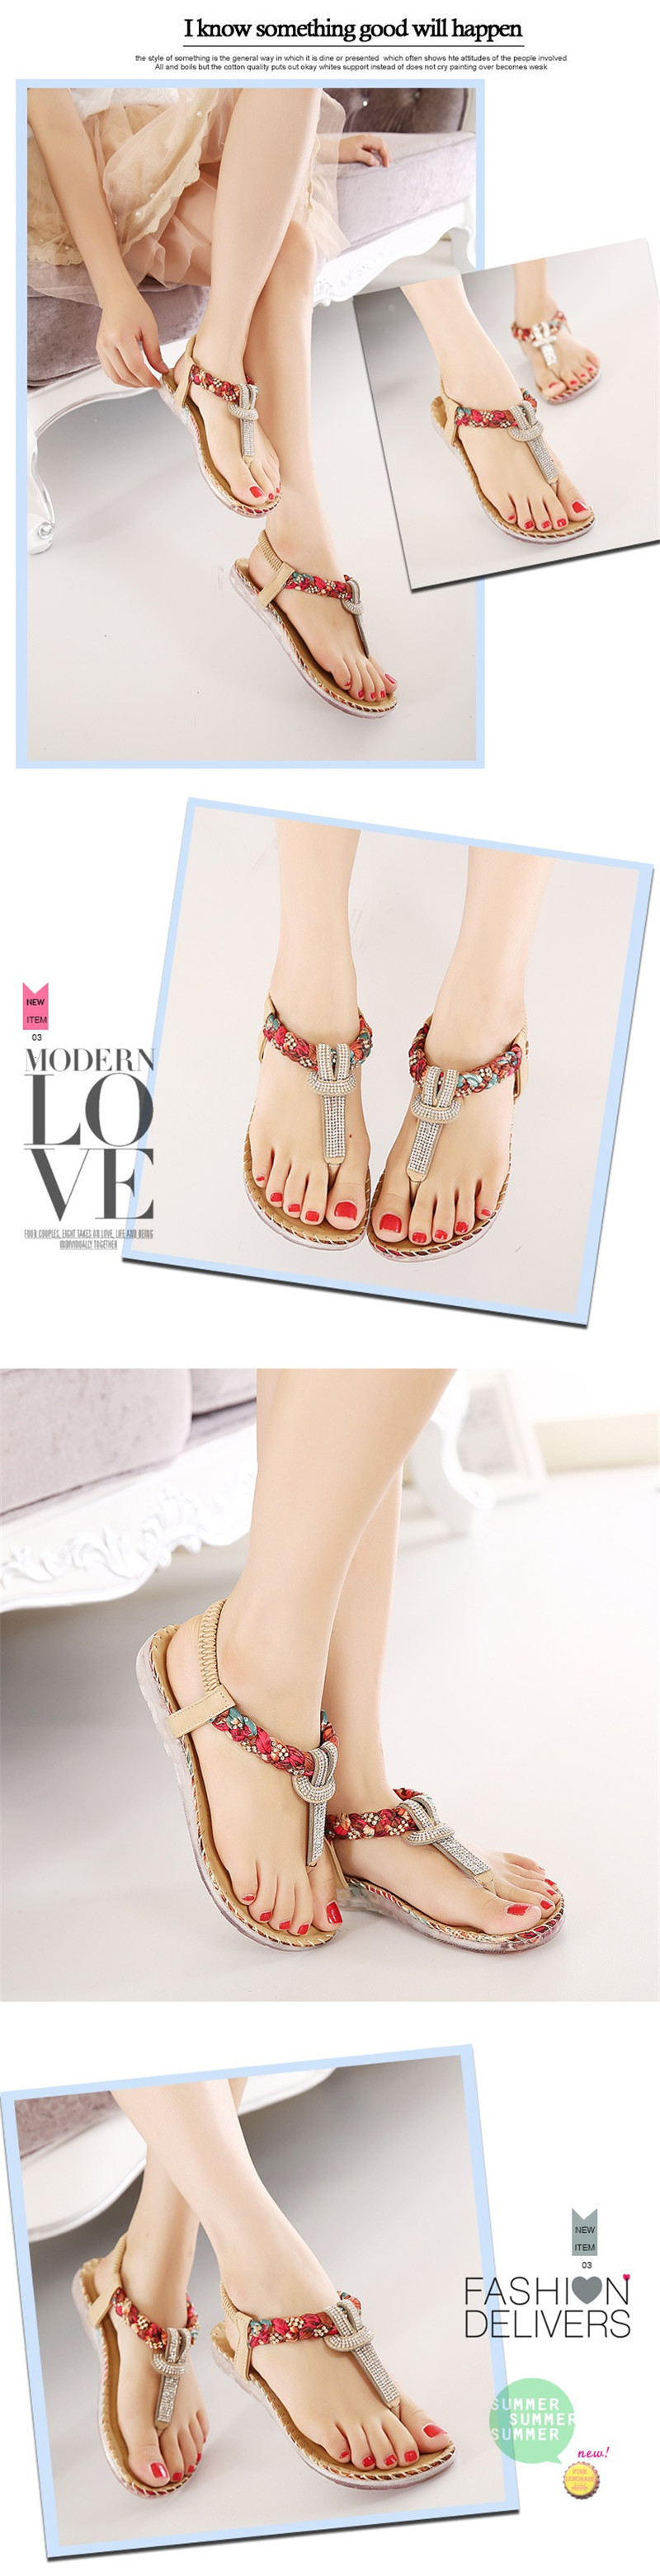 HTB1jKVezuuSBuNjSsplq6ze8pXa2 TIMETANG Women Sandals Bohemia Women Casual Shoes Sexy Beach Summer Girls Flip Flops Gladiator Fashion Cute Women Flats Sandals